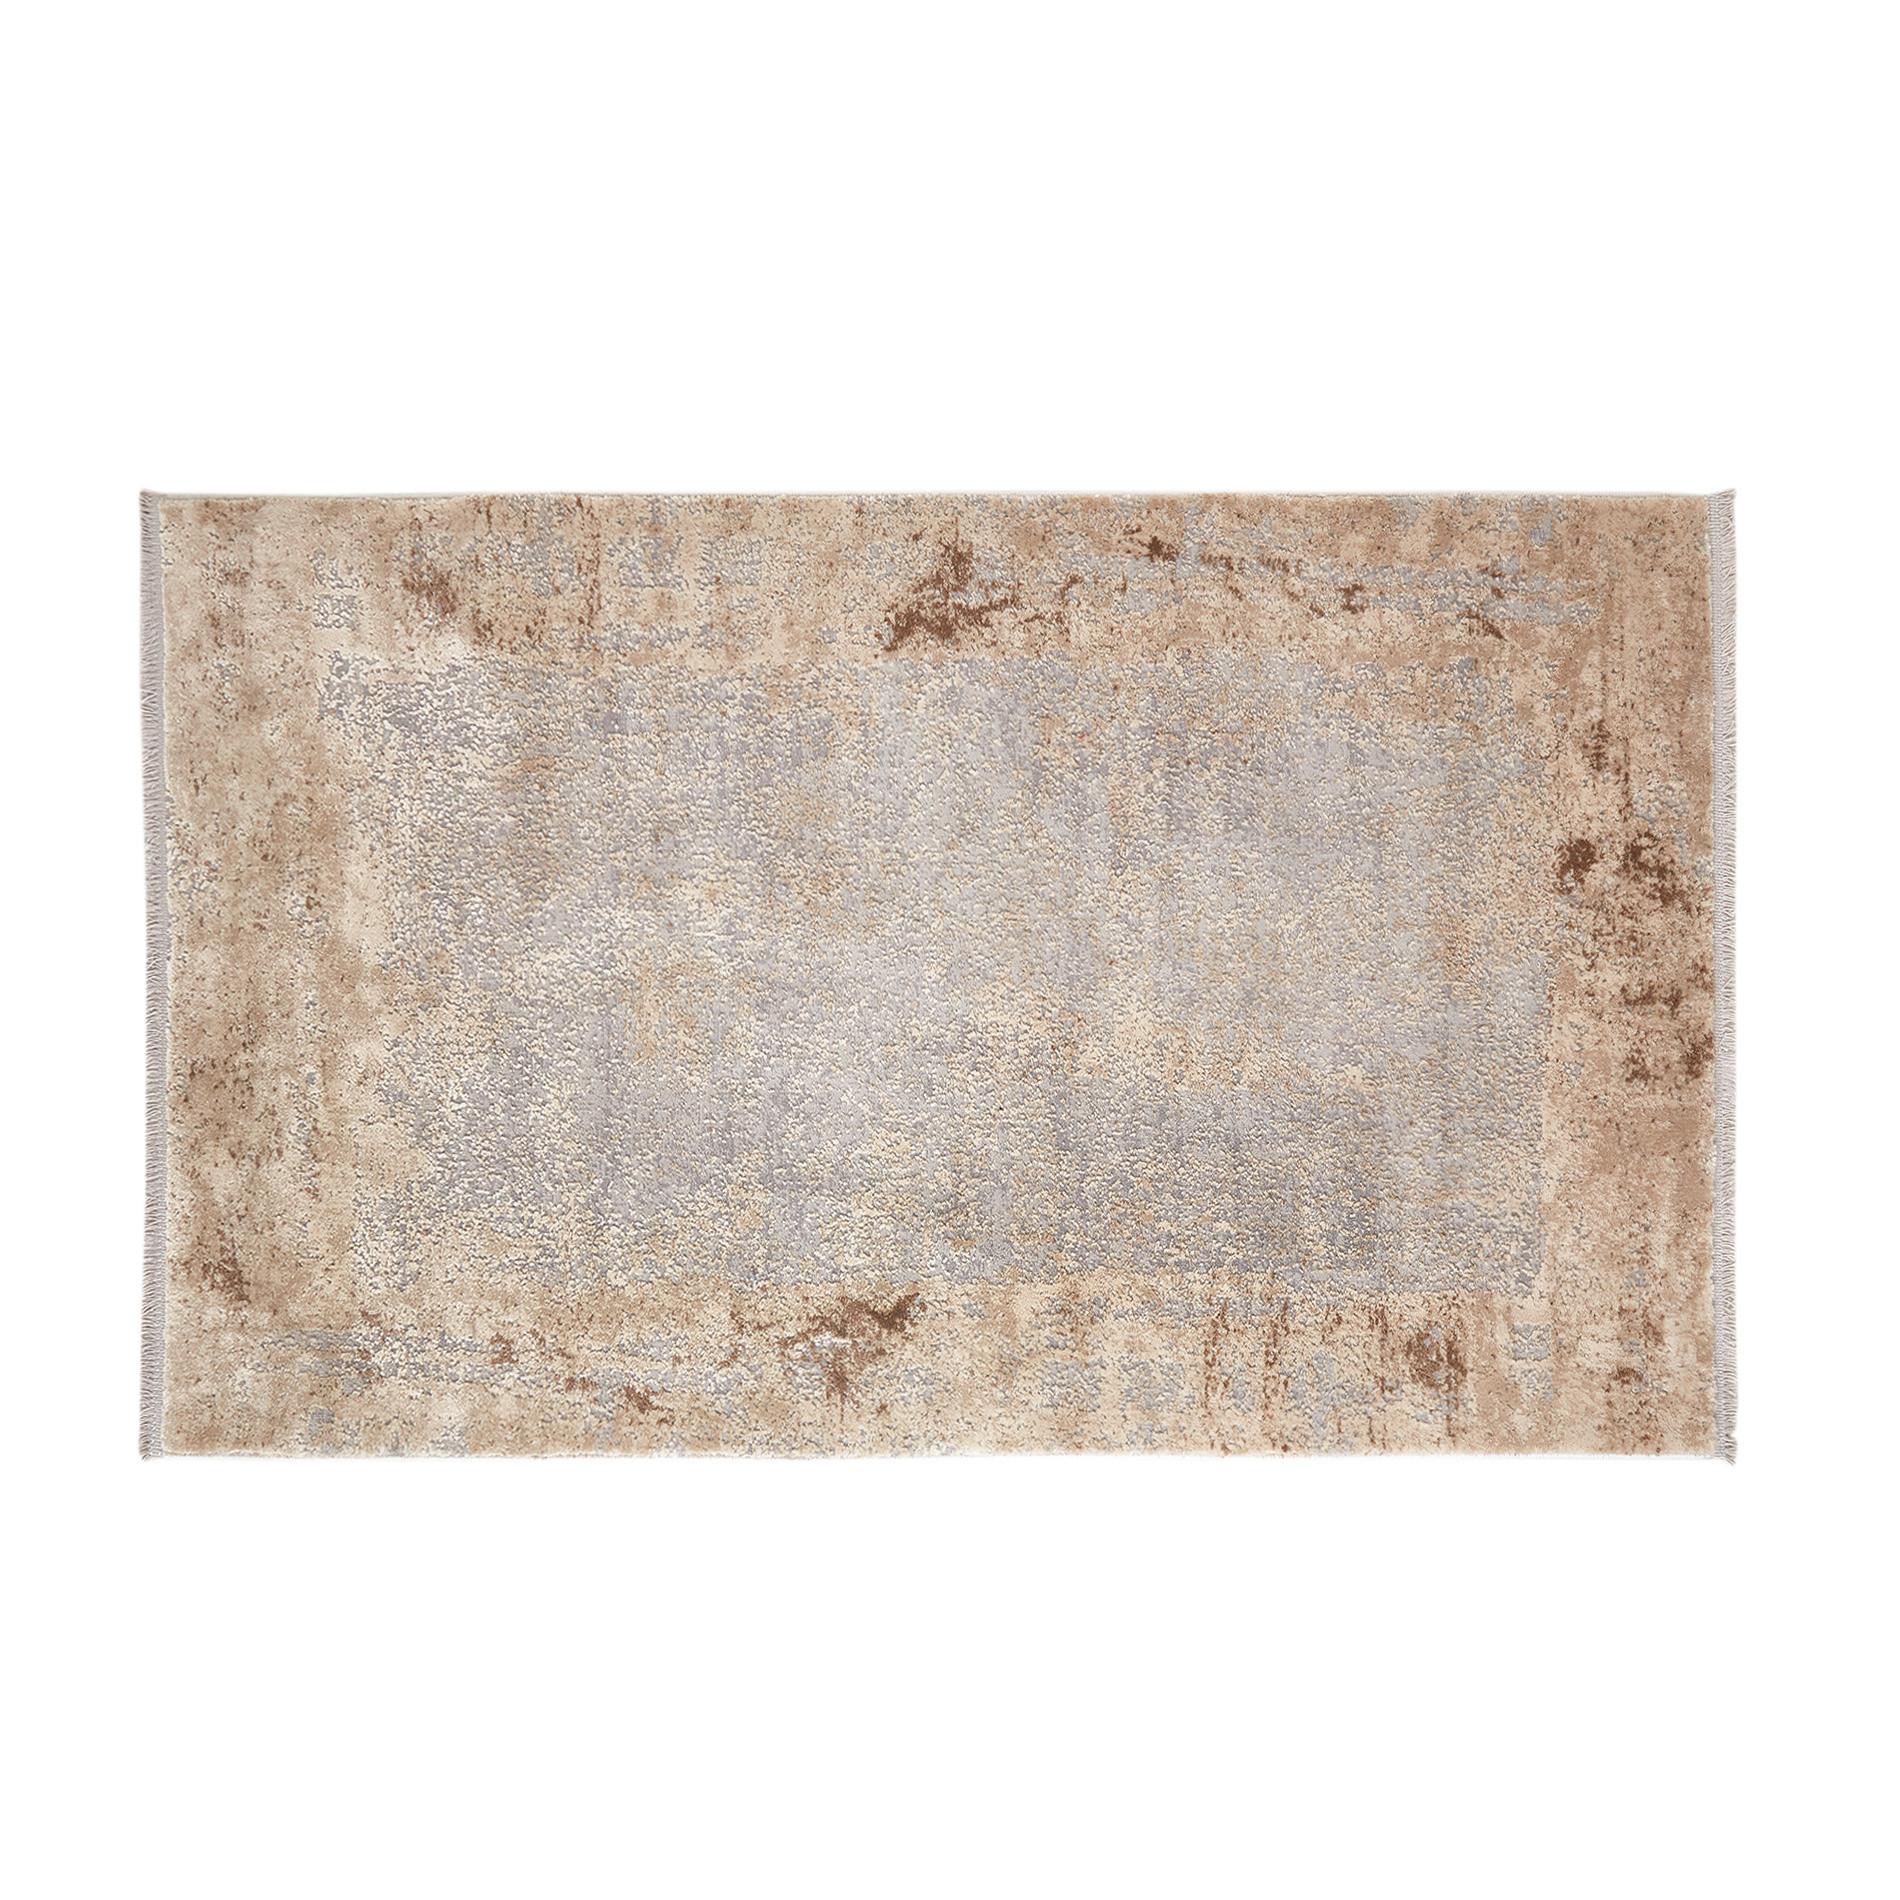 Tappeto motivo sfumato bicolore, Beige, large image number 0